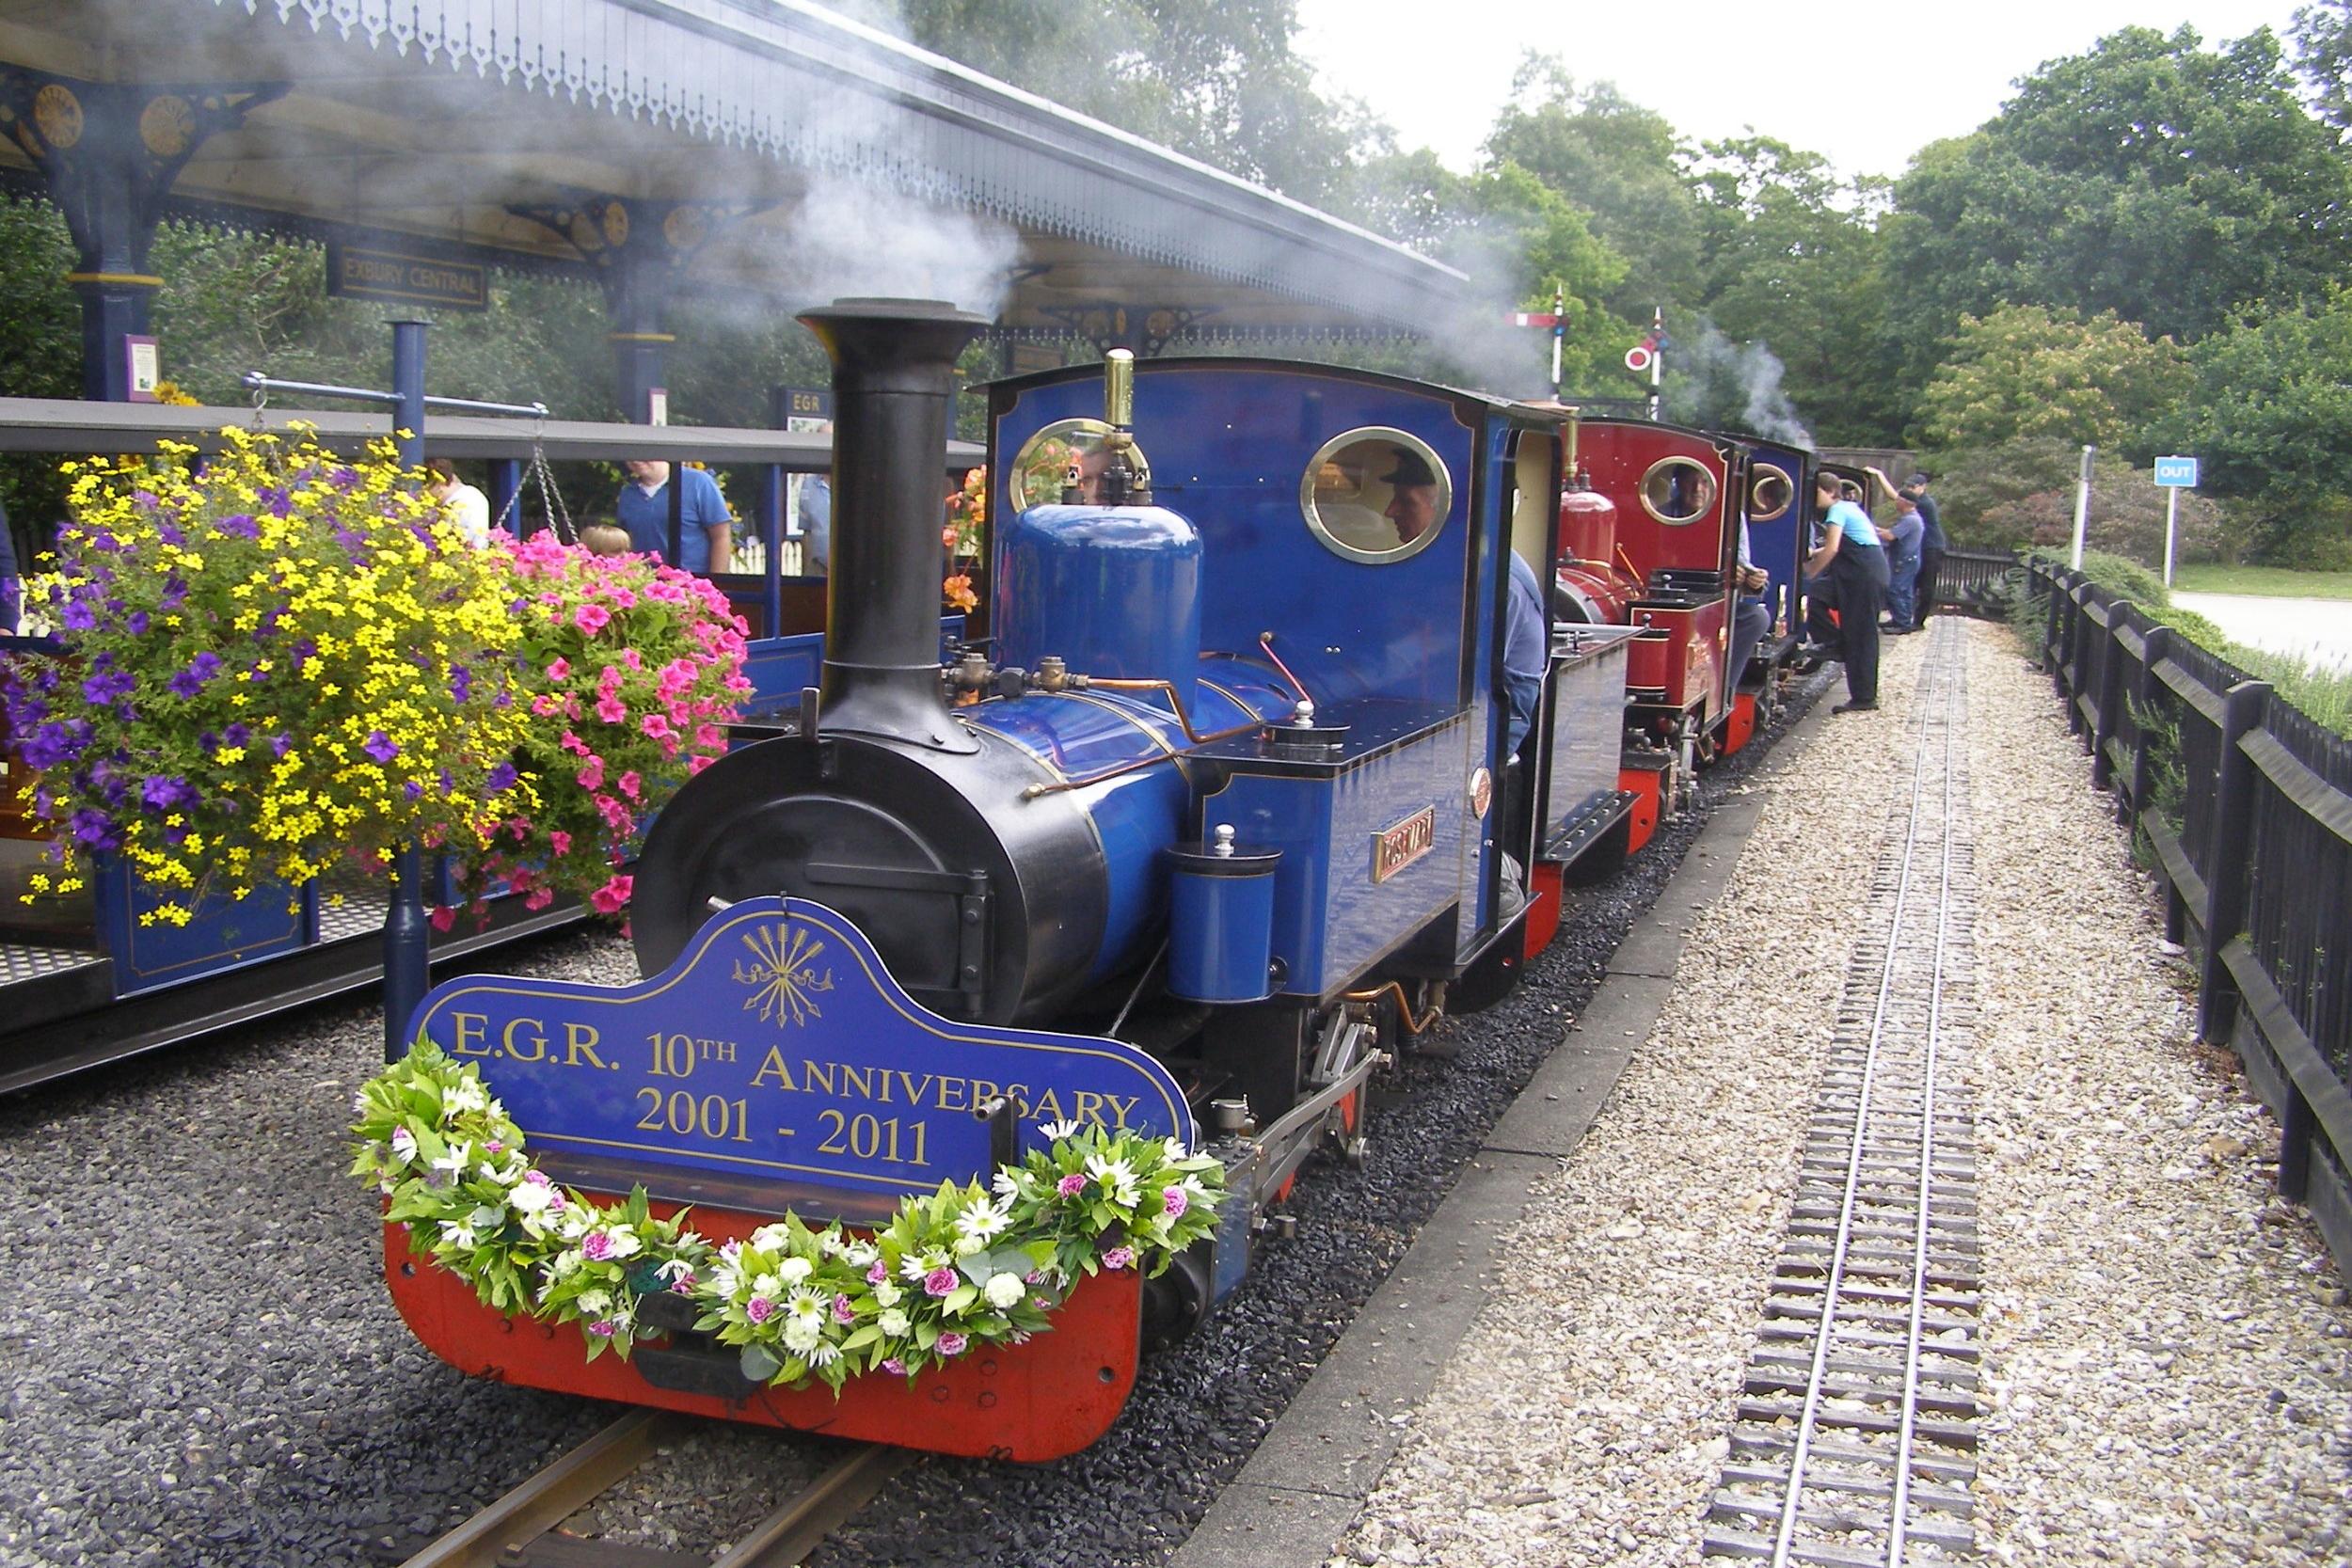 10th-anniversary-celebrations-on-the-Exbury-gardens-Railway-in-August.jpg